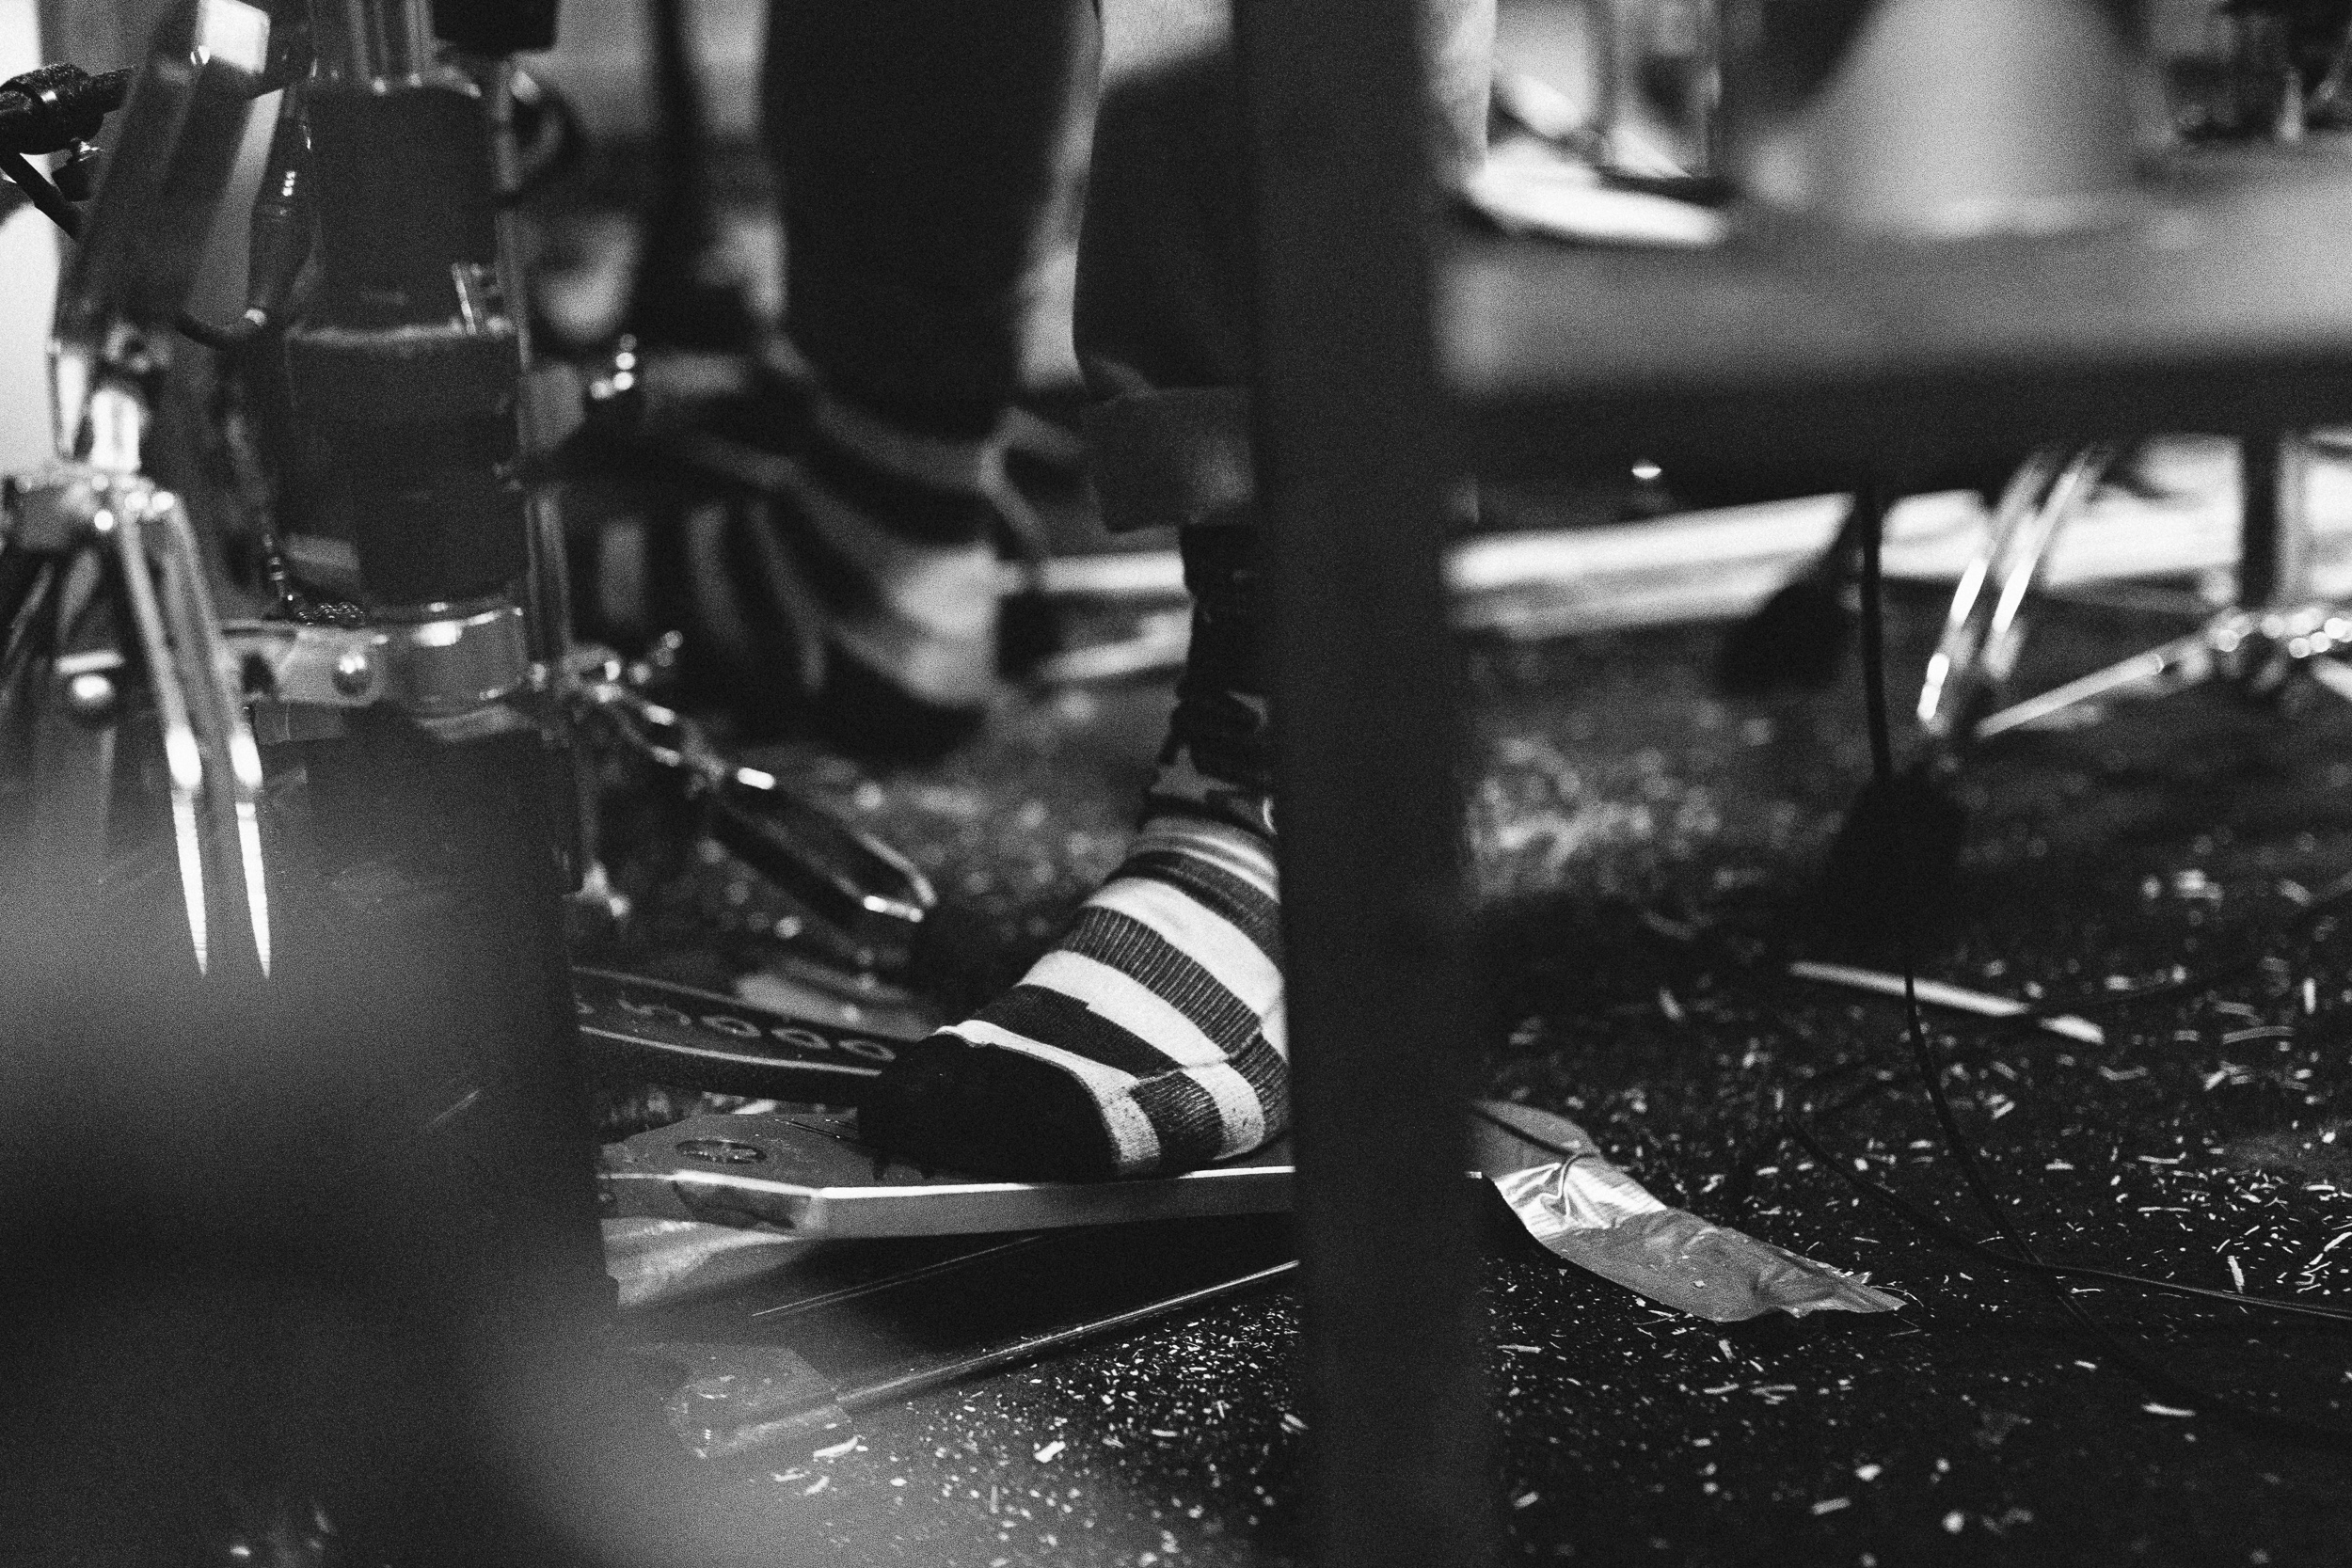 Socks - A Day To Remember in Studio